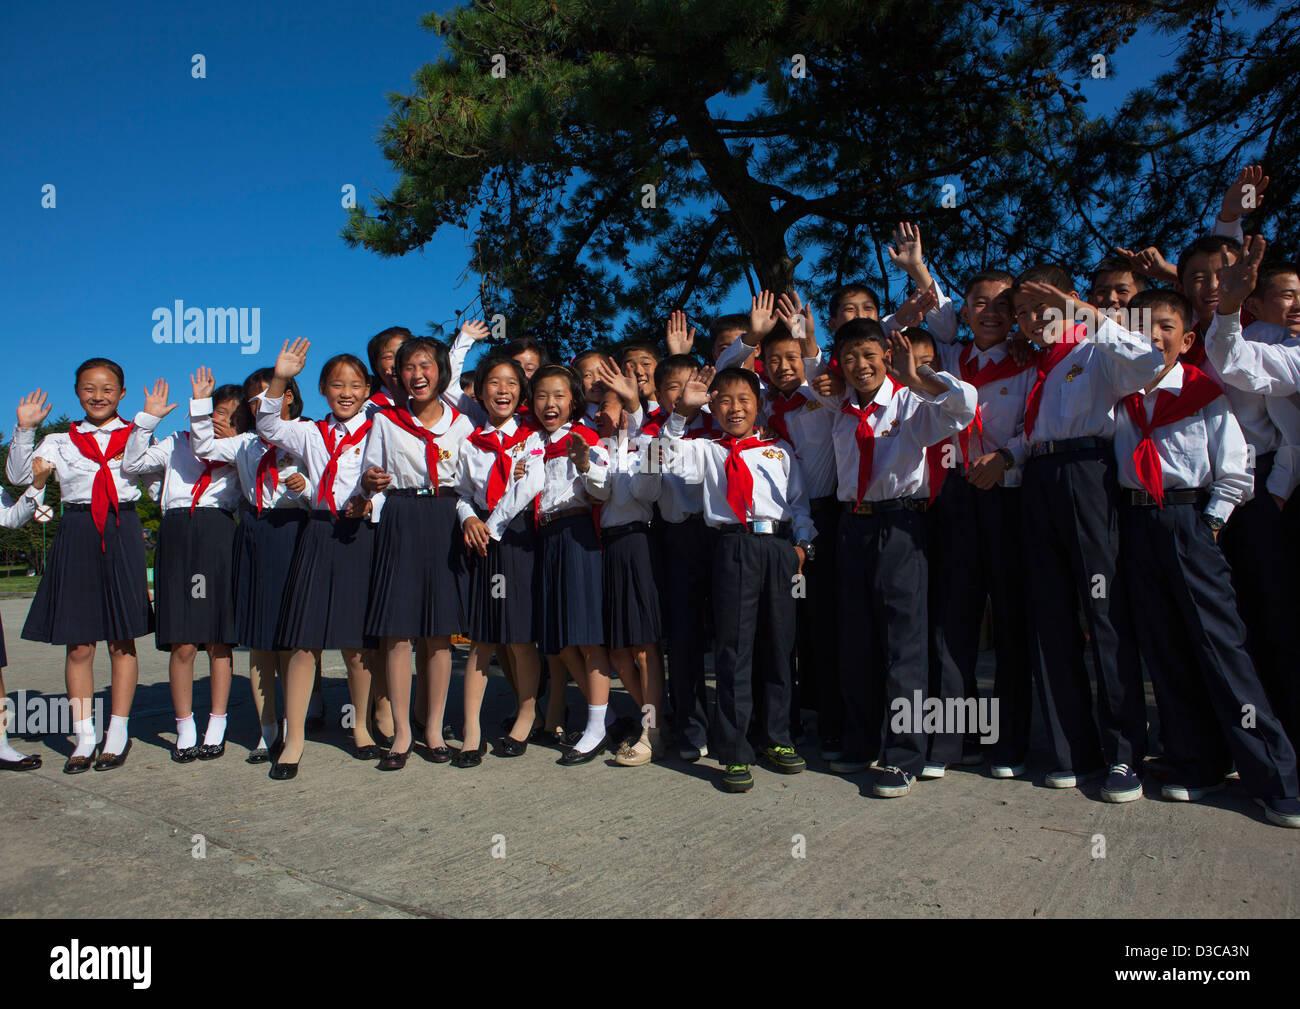 Pioneers At Songdowon International Children's Camp, Wonsan, North Korea, North Korea - Stock Image